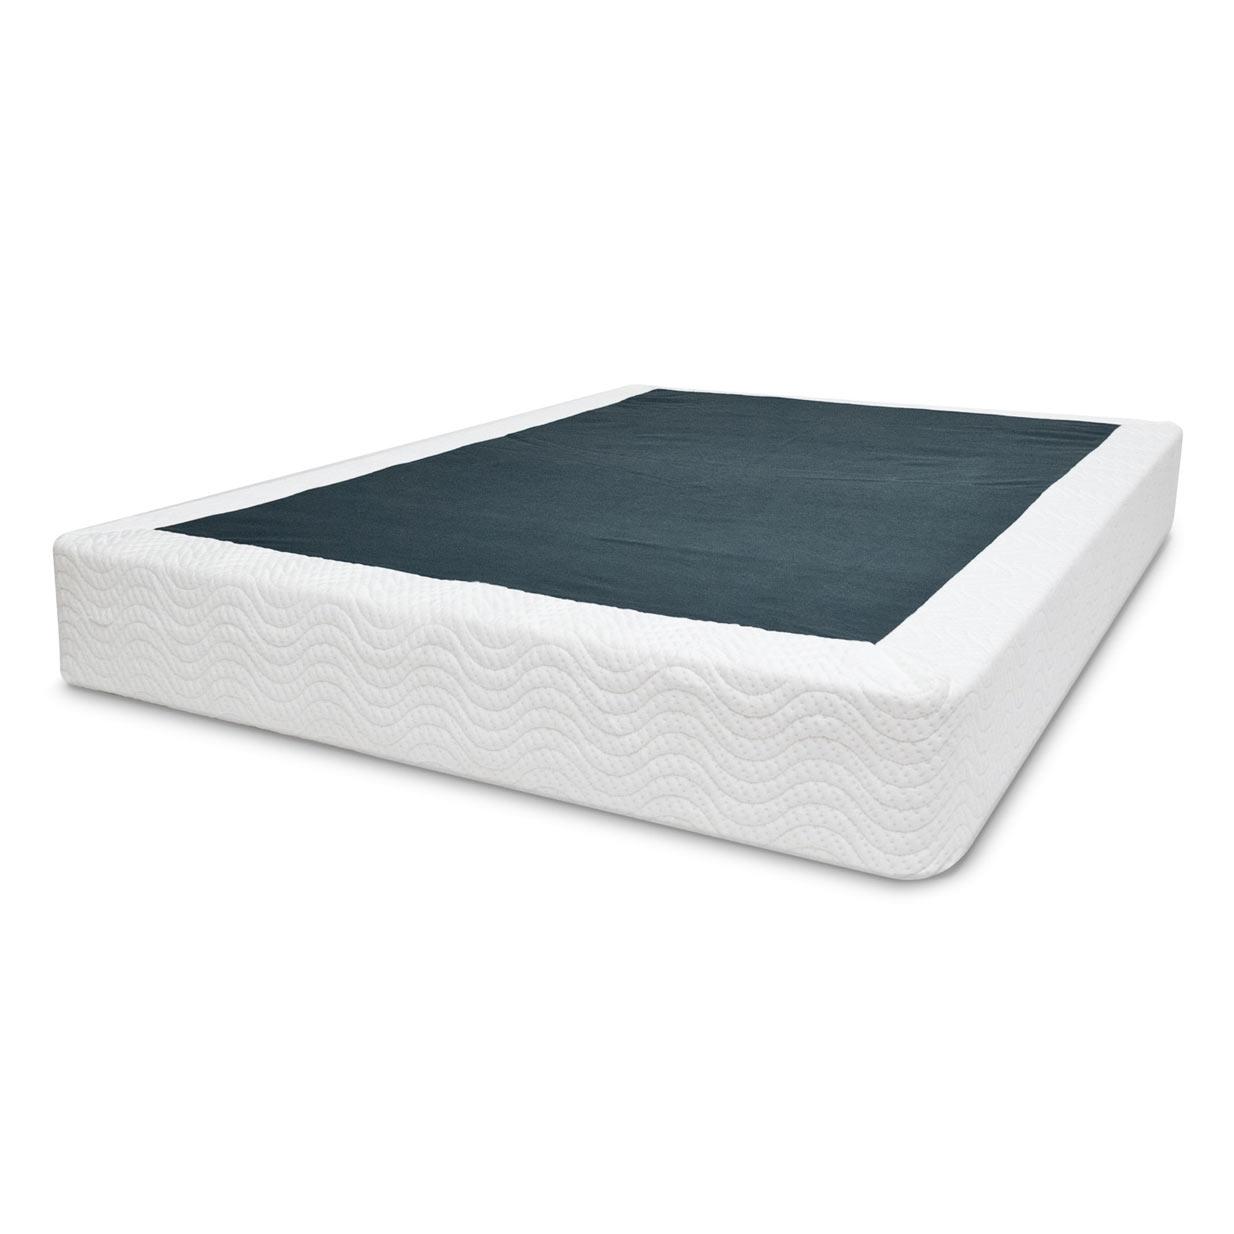 mattress and box spring queen. mattress and box spring queen